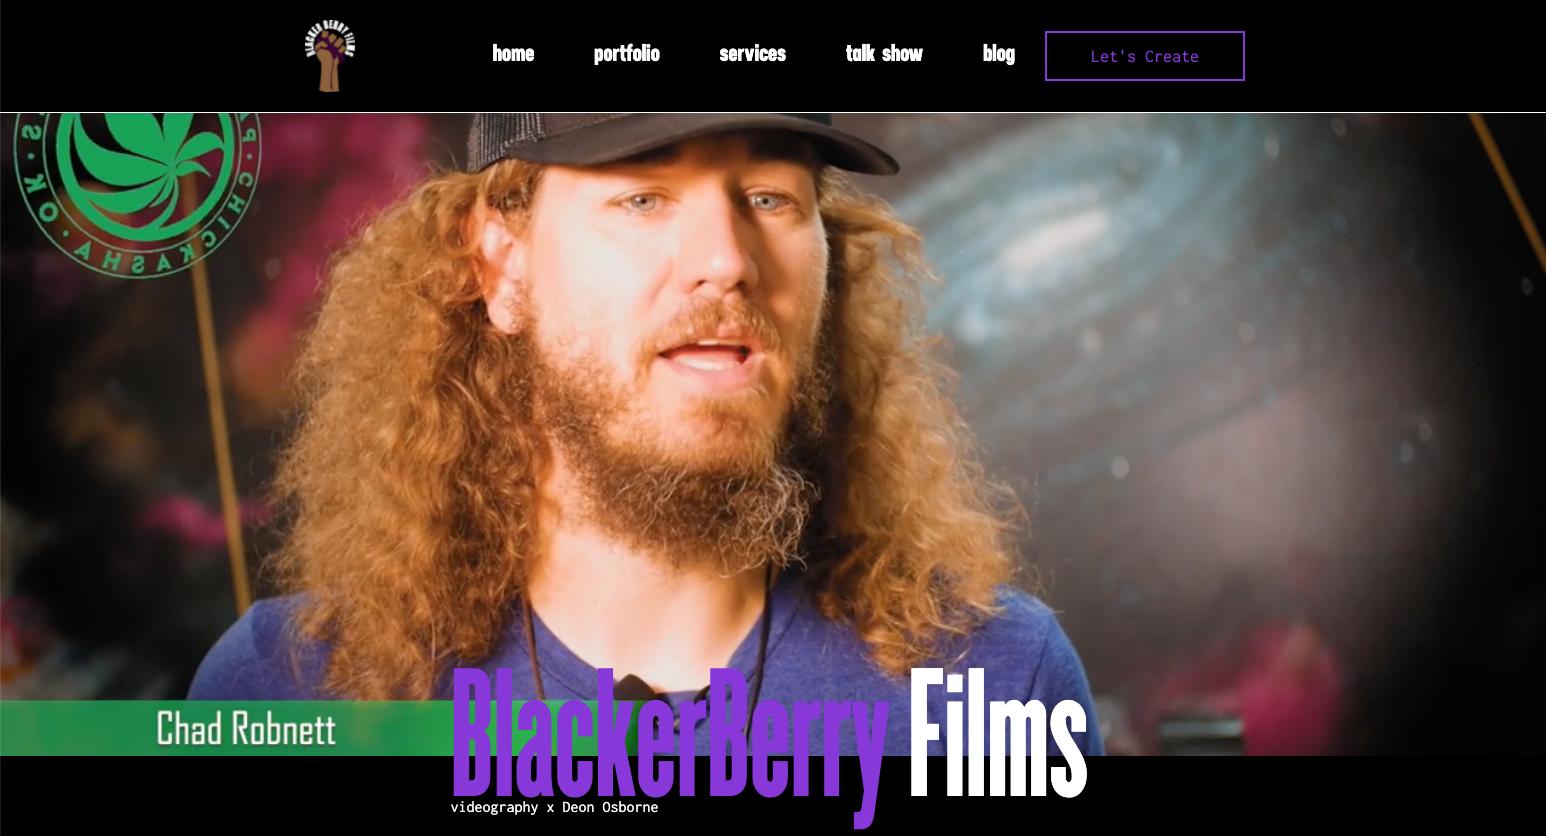 Blackerberry Films